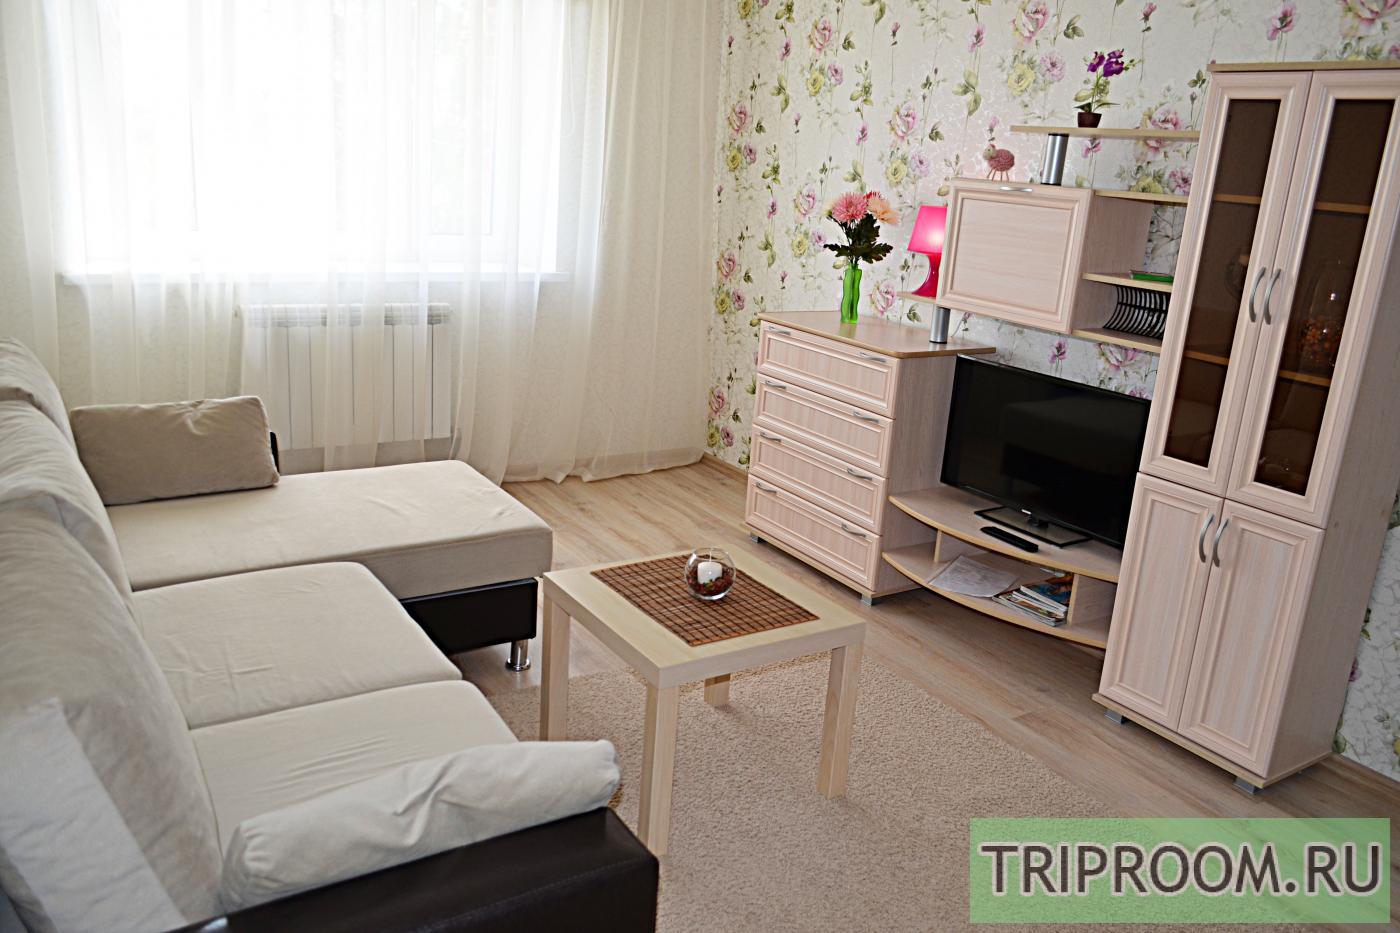 1-комнатная квартира посуточно (вариант № 15487), ул. Брылевка улица, фото № 12